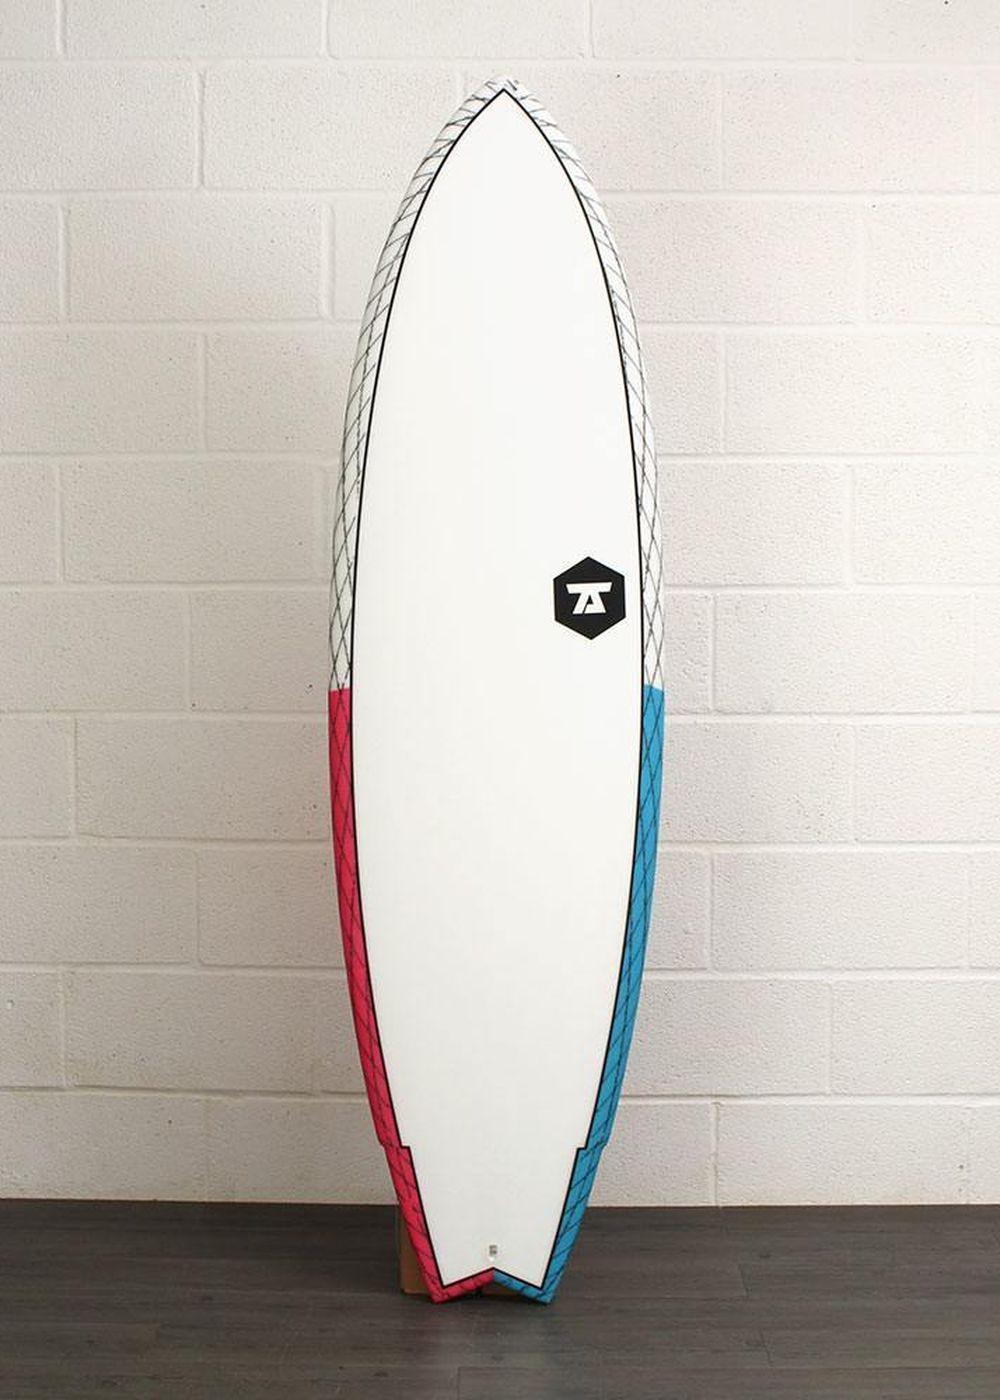 7S SUPER FISH 3 CV SURFBOARD 6ft 3 Blue/Red